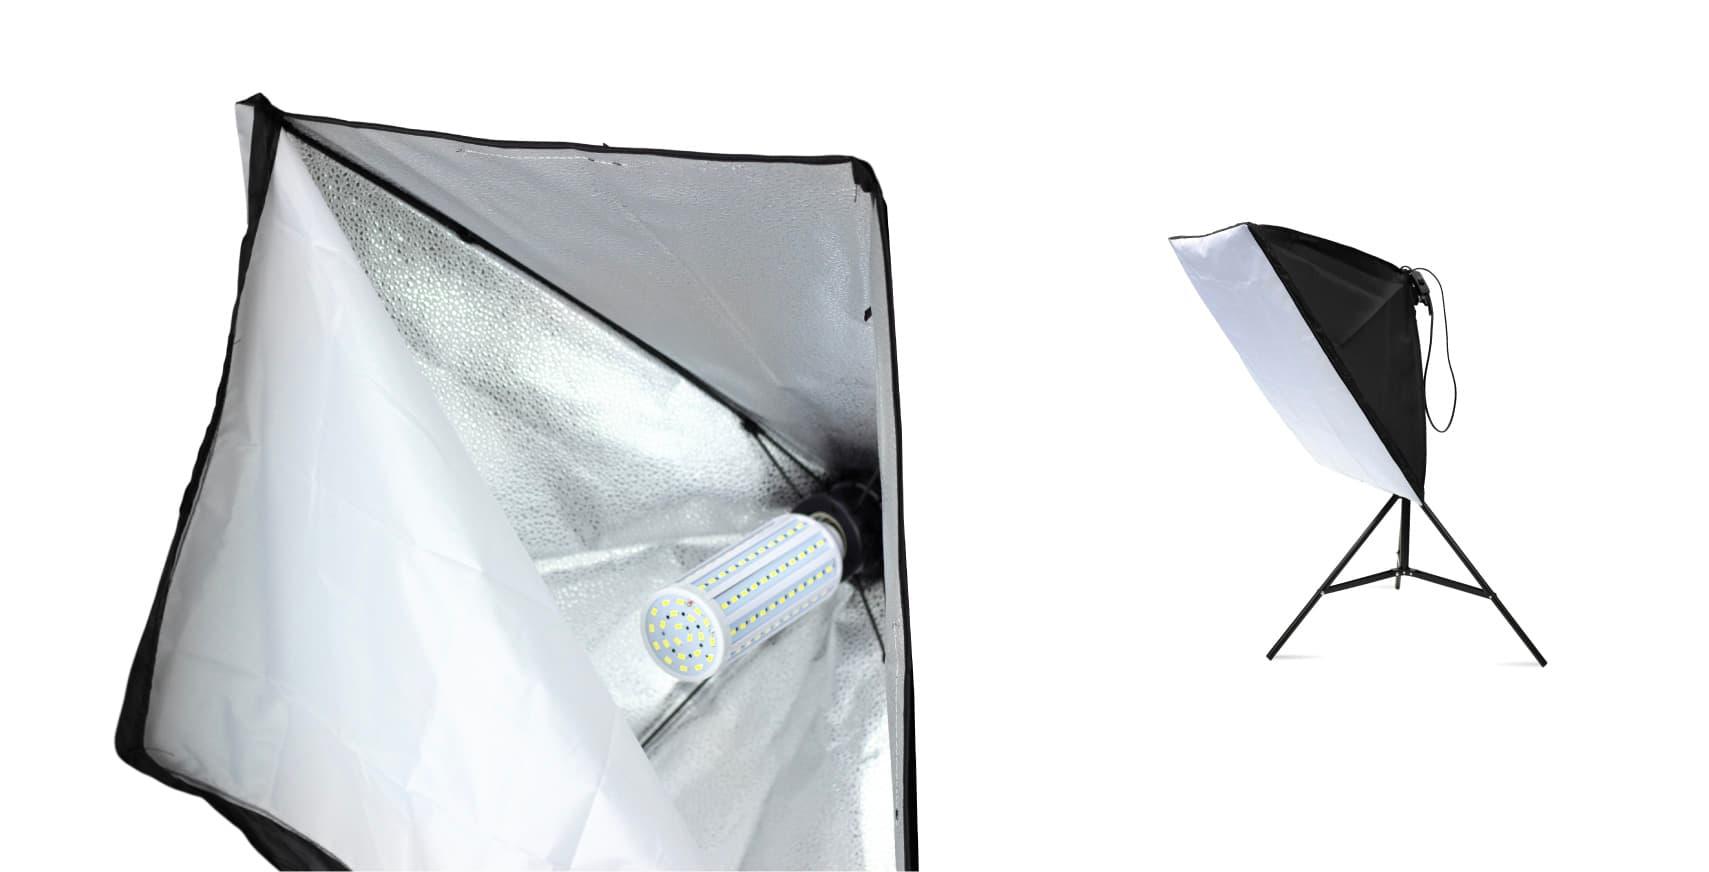 lighting softboxes with LED bulbs